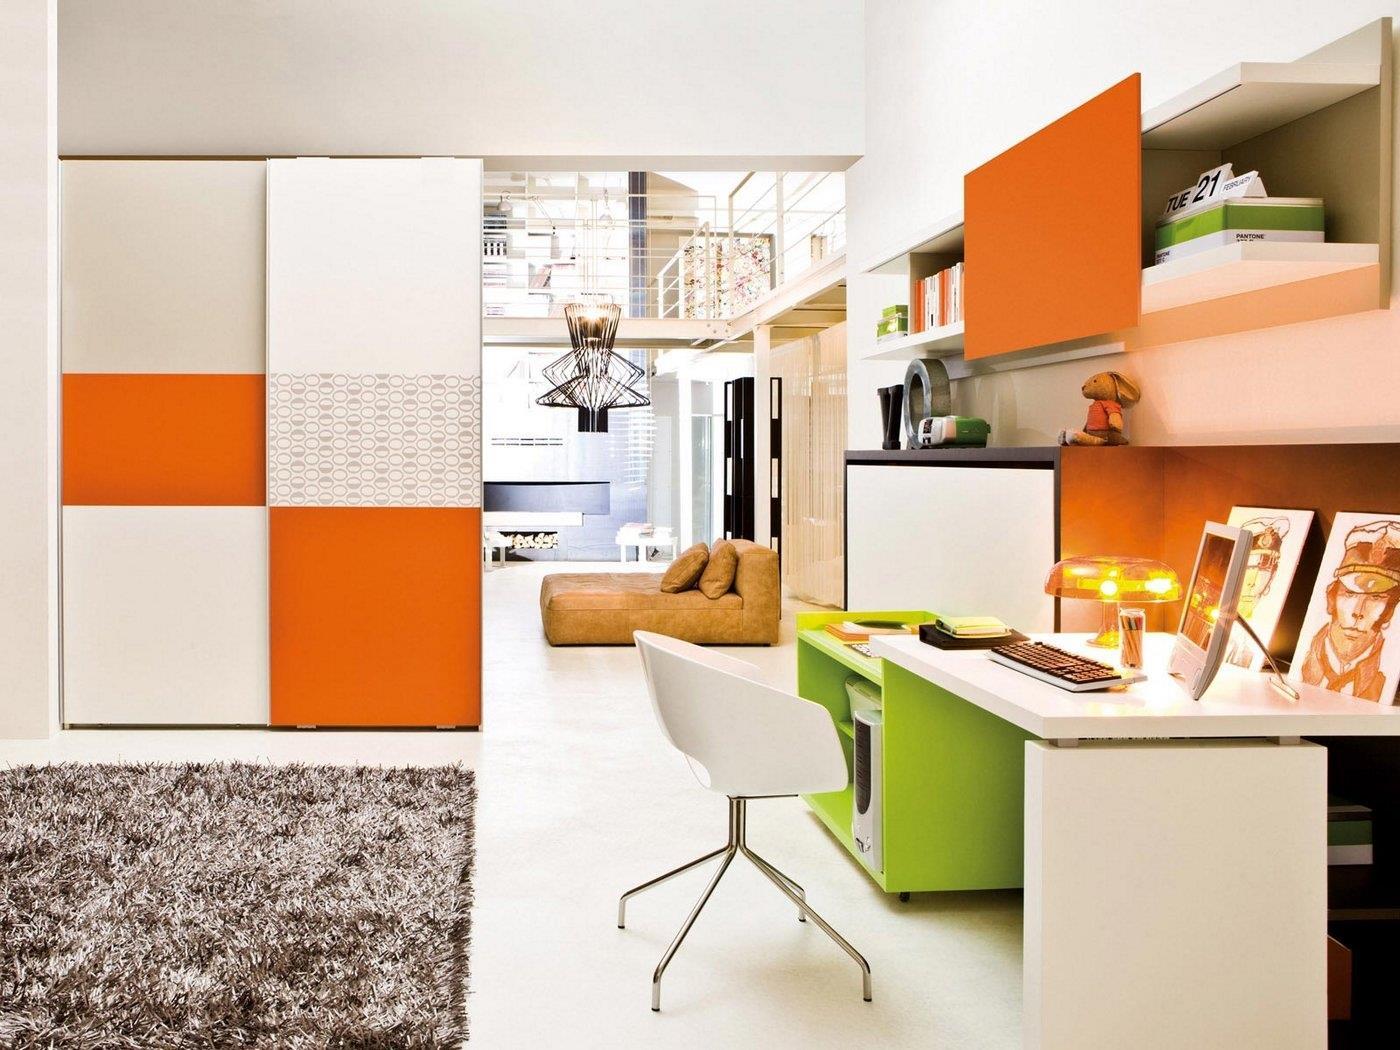 43-mobilier-inteligent-design-interior-smart